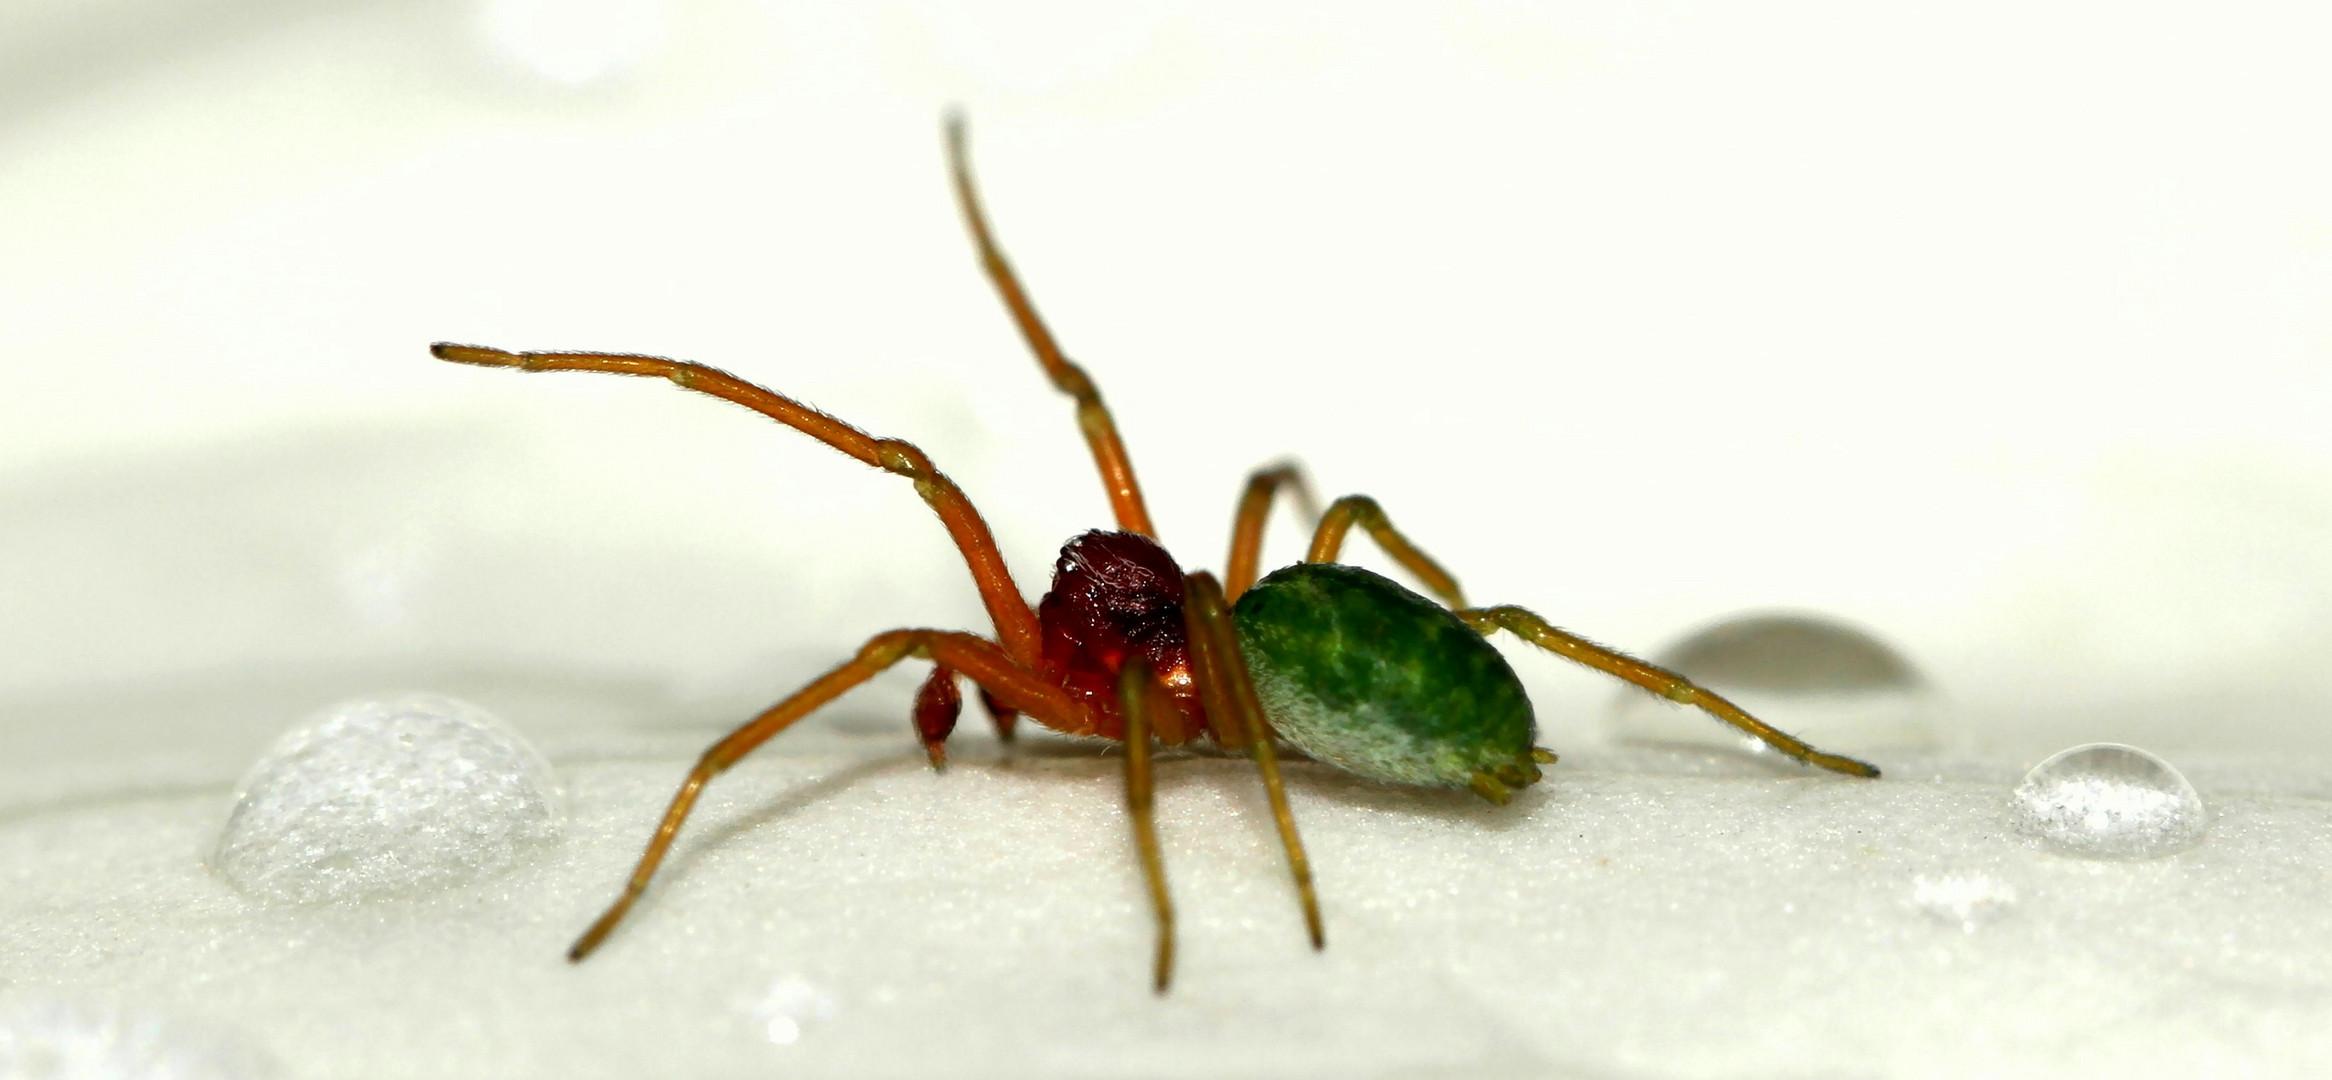 très petite araignée